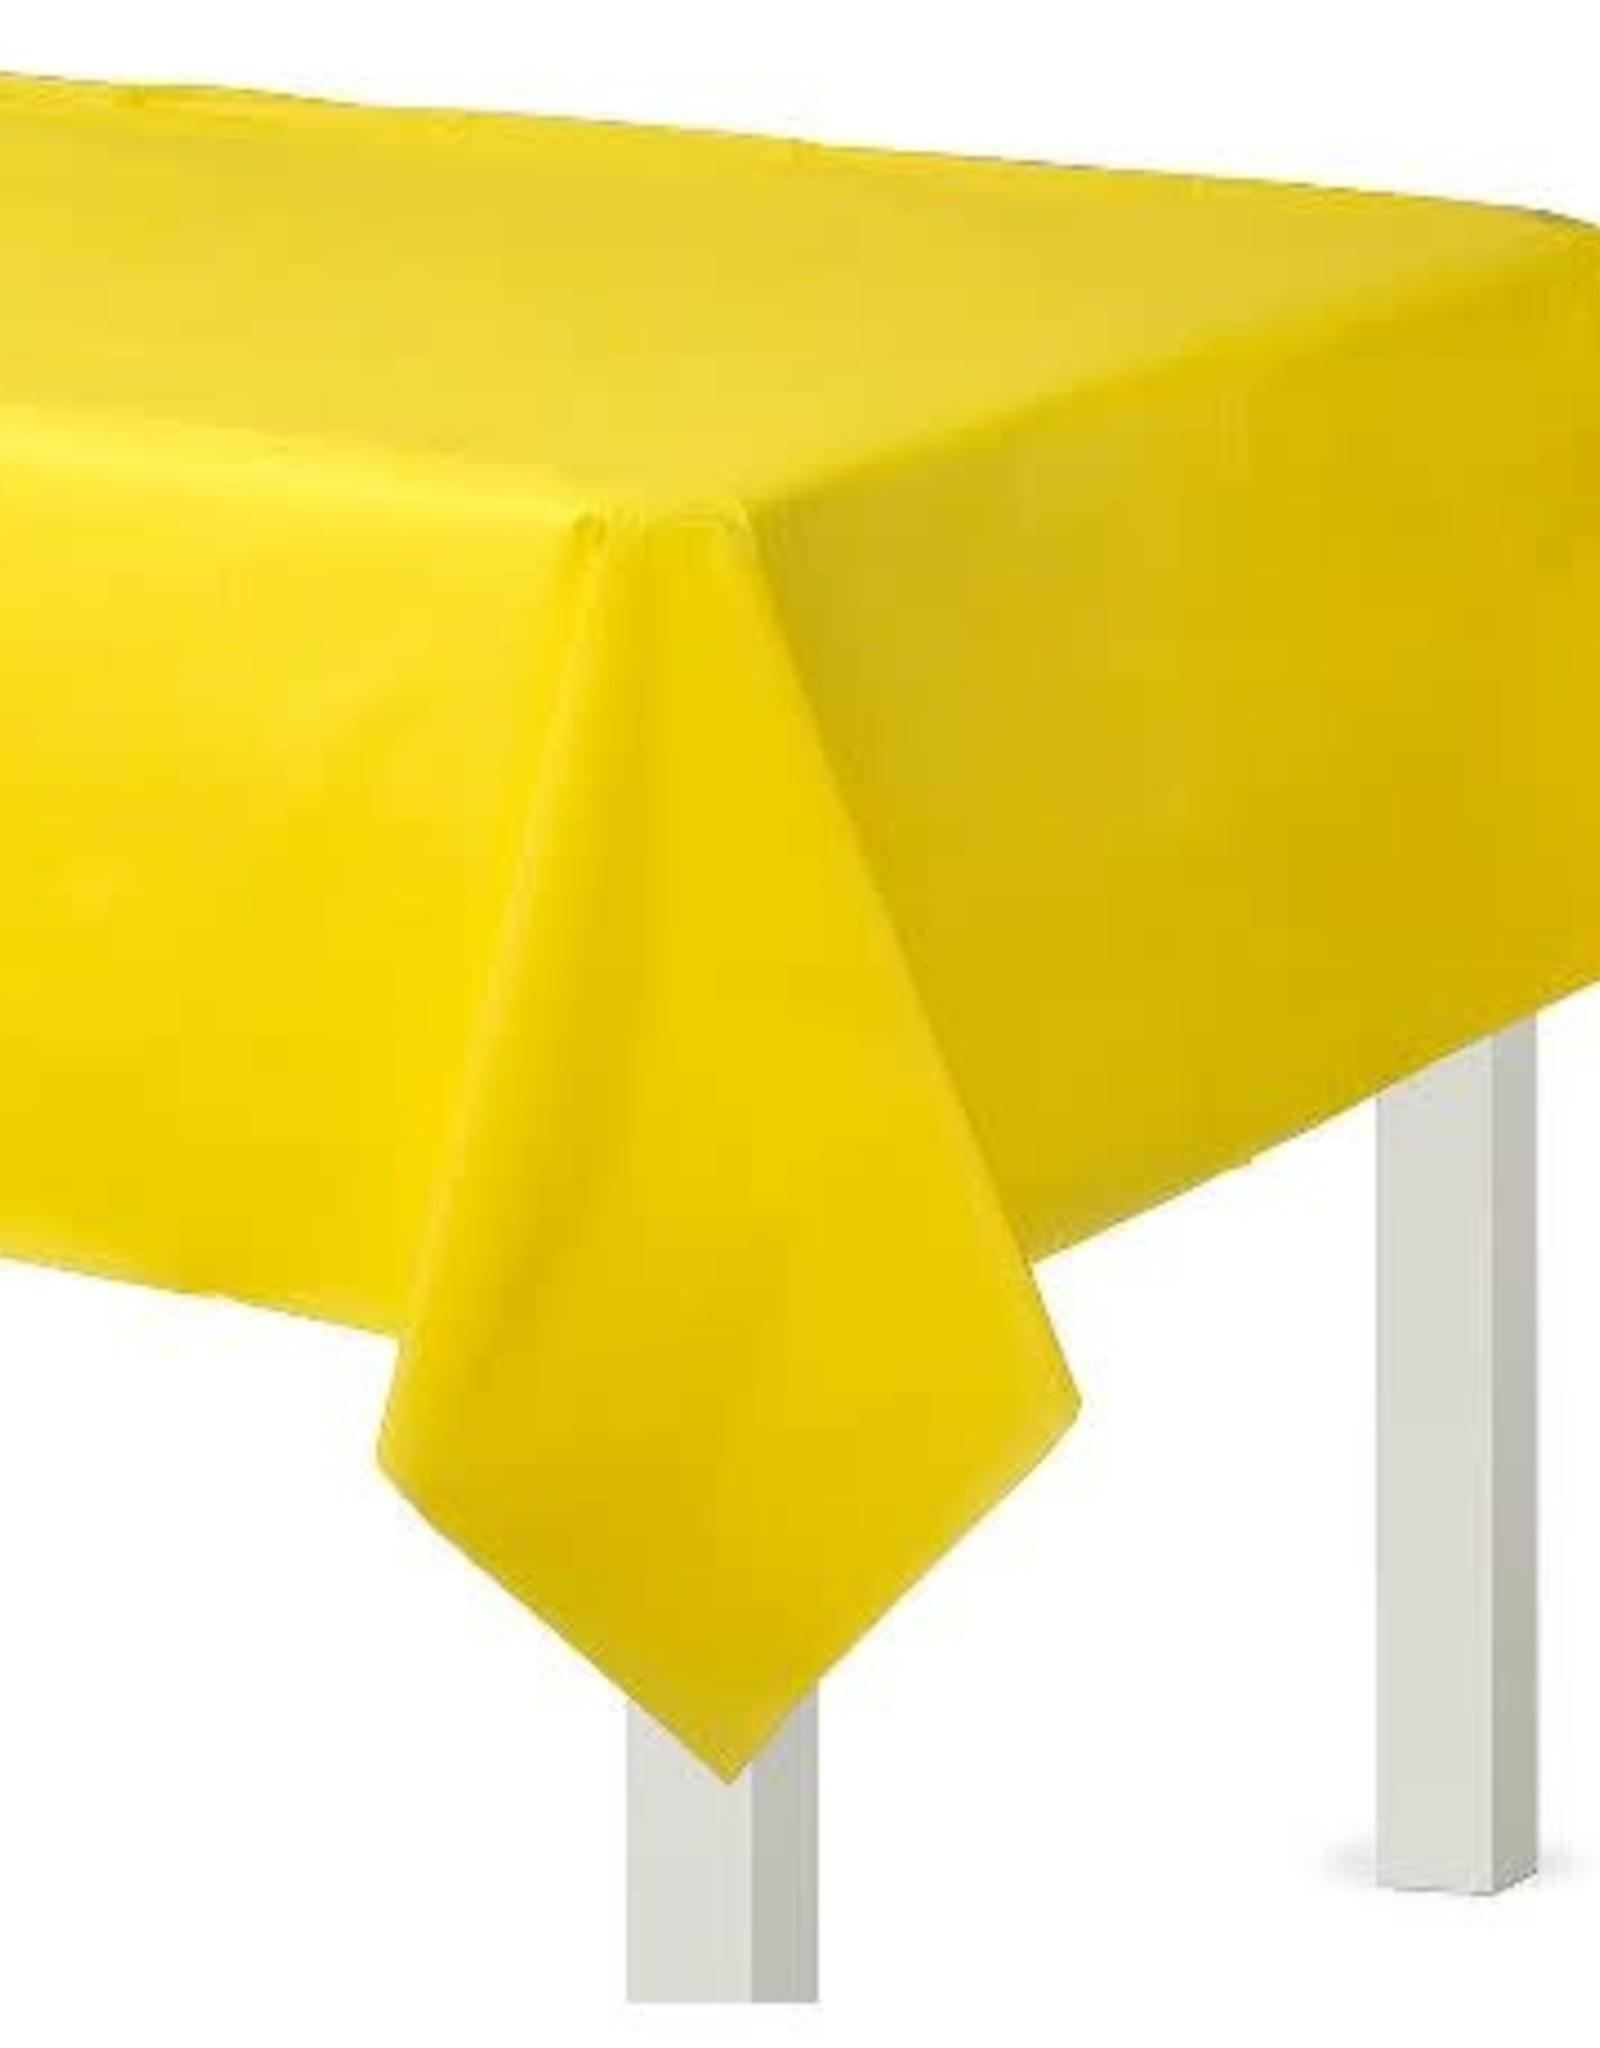 Plastic Yellow Tablecloth  54 x 108